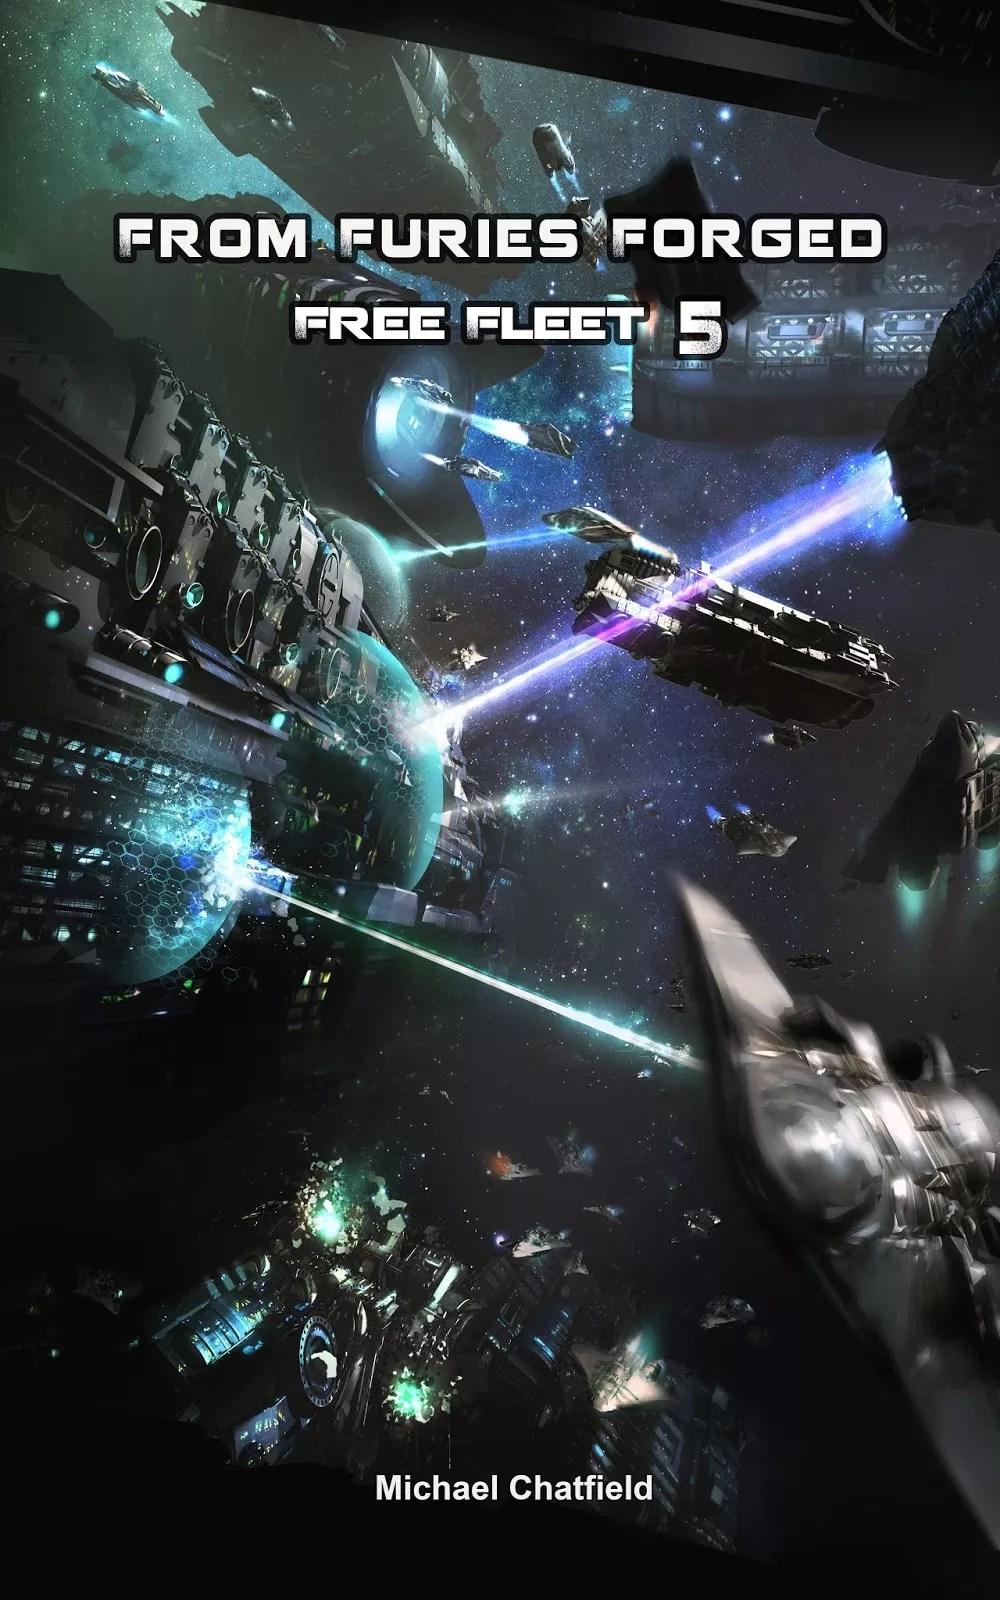 free fleet series